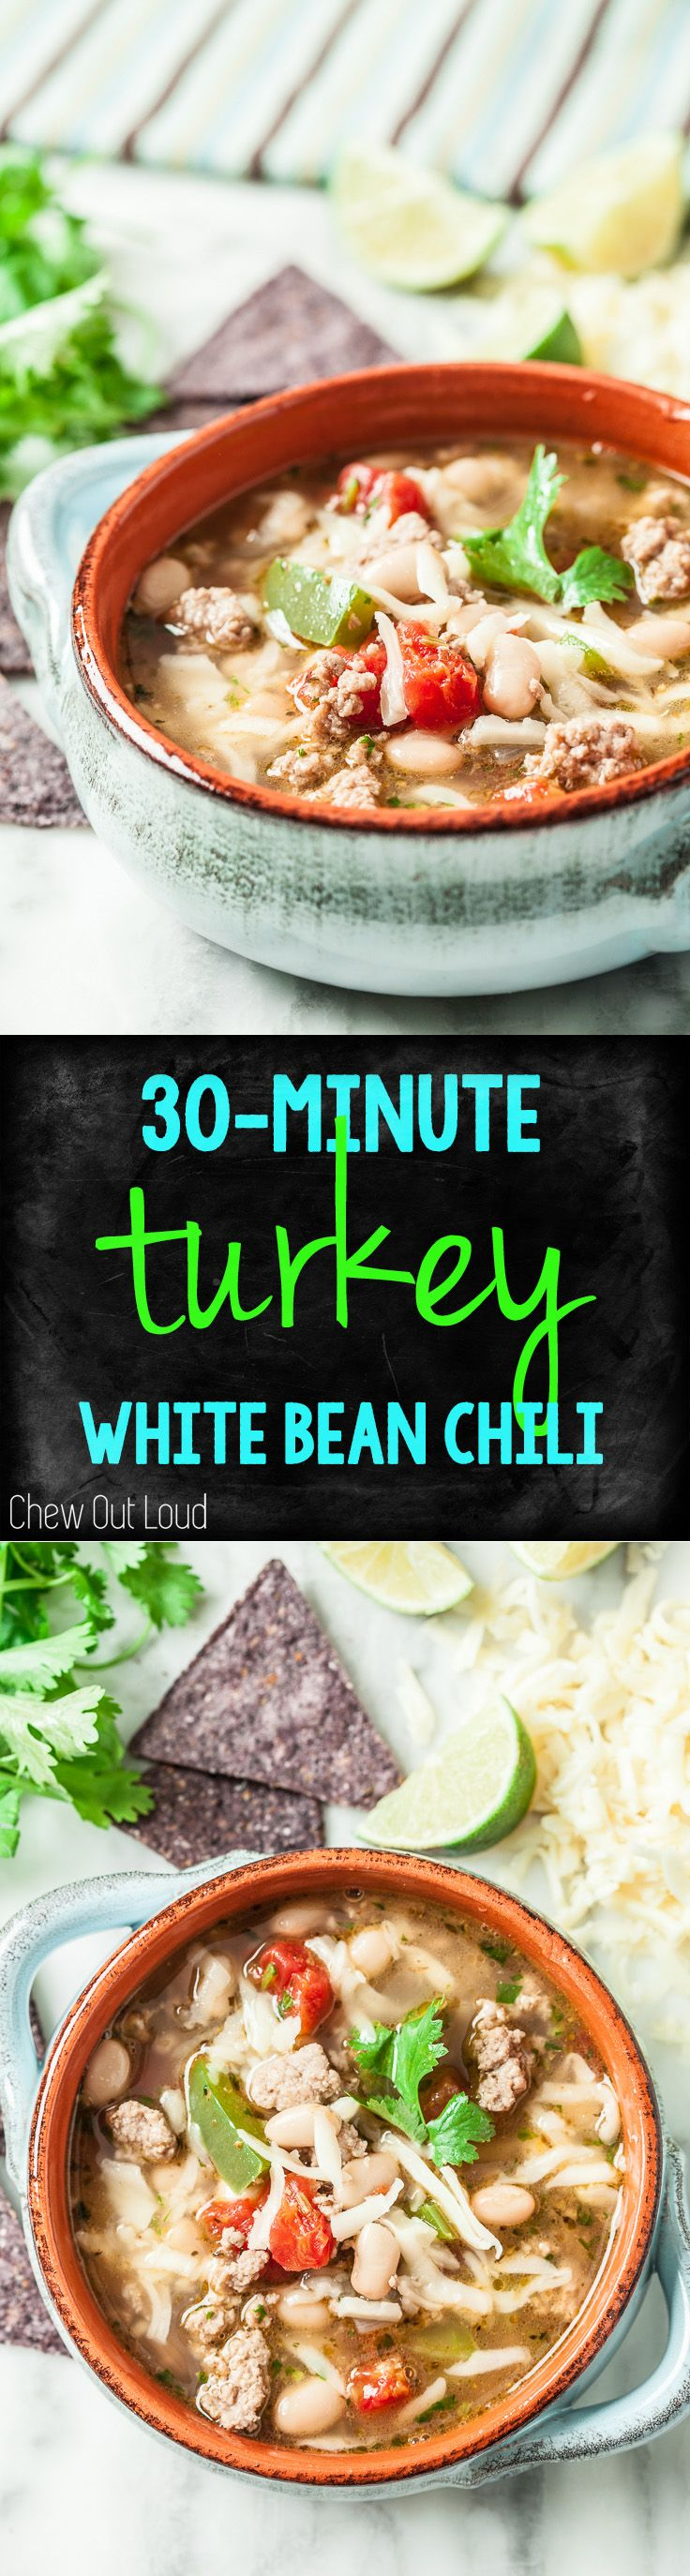 30-Minute White Bean Turkey Chili | Recipe | Chili, The o'jays and ...